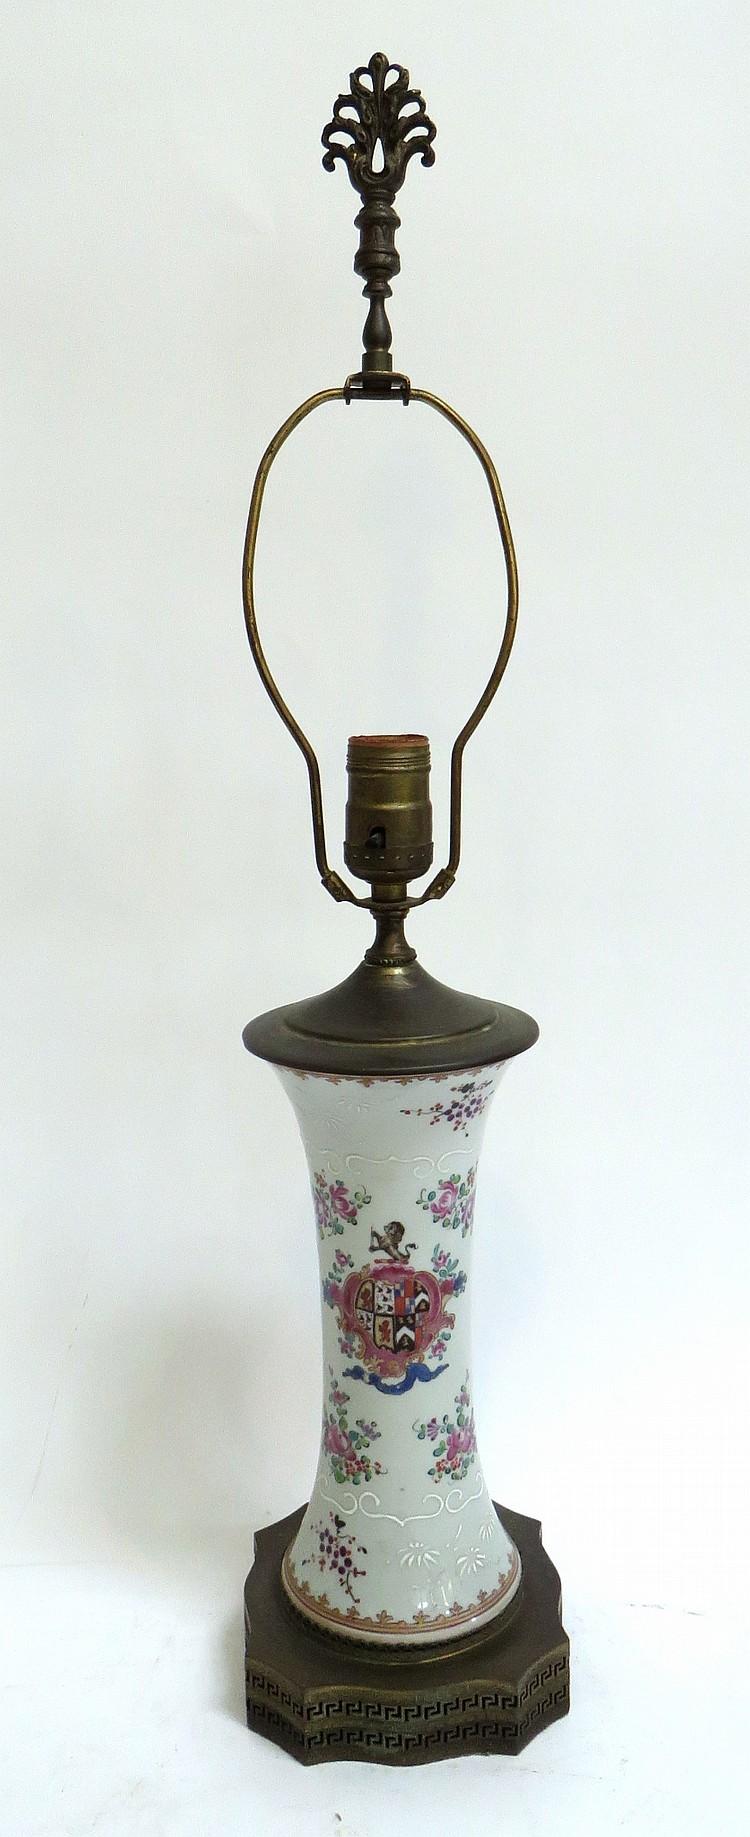 LAMP WITH ANTIQUE PORCELAIN BASE